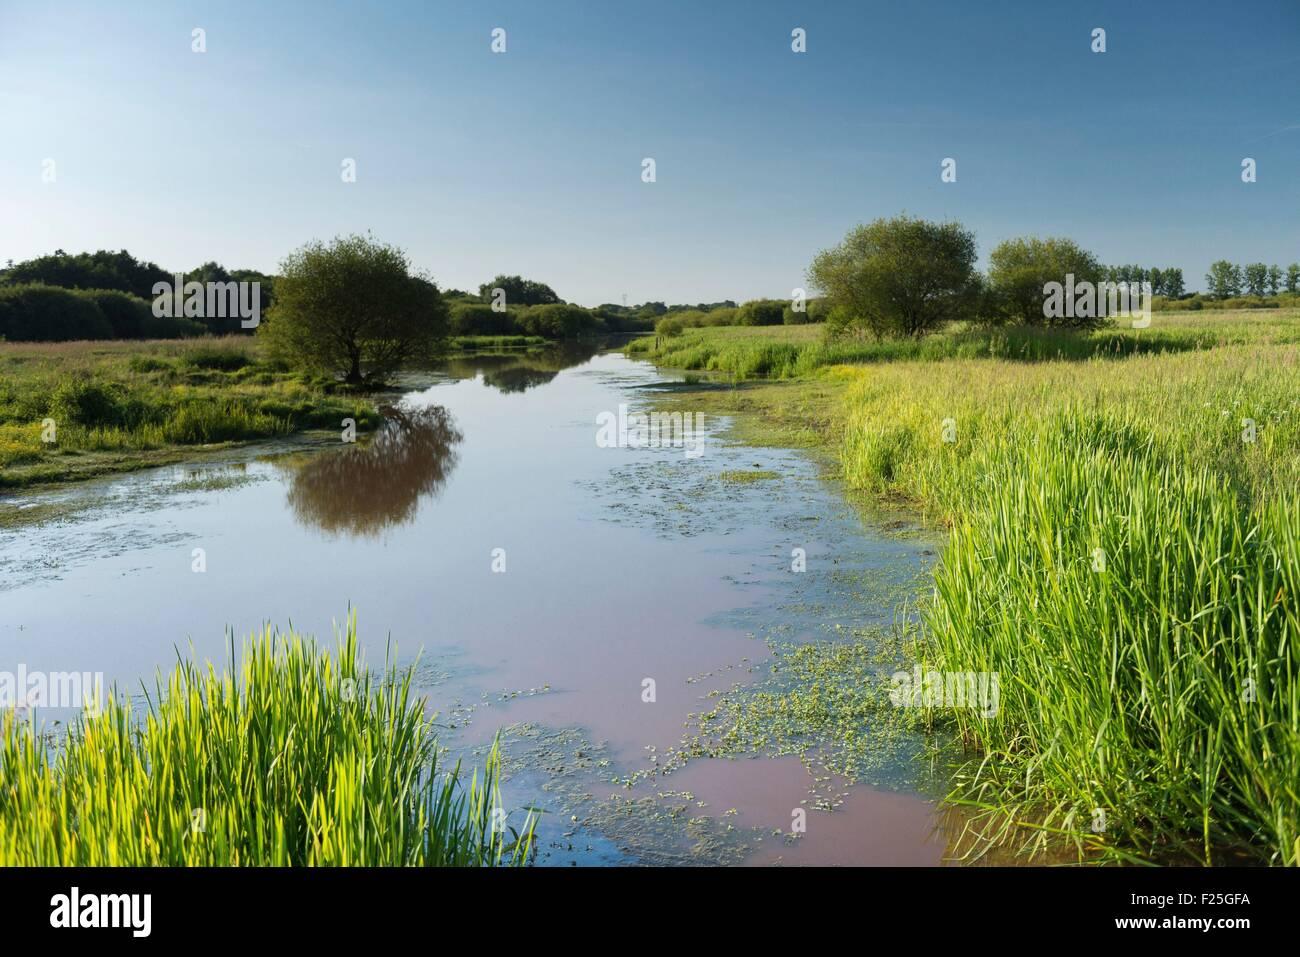 France, Ille et Vilaine, La Chapelle de Brain, marshes of Gannedel - Stock Image